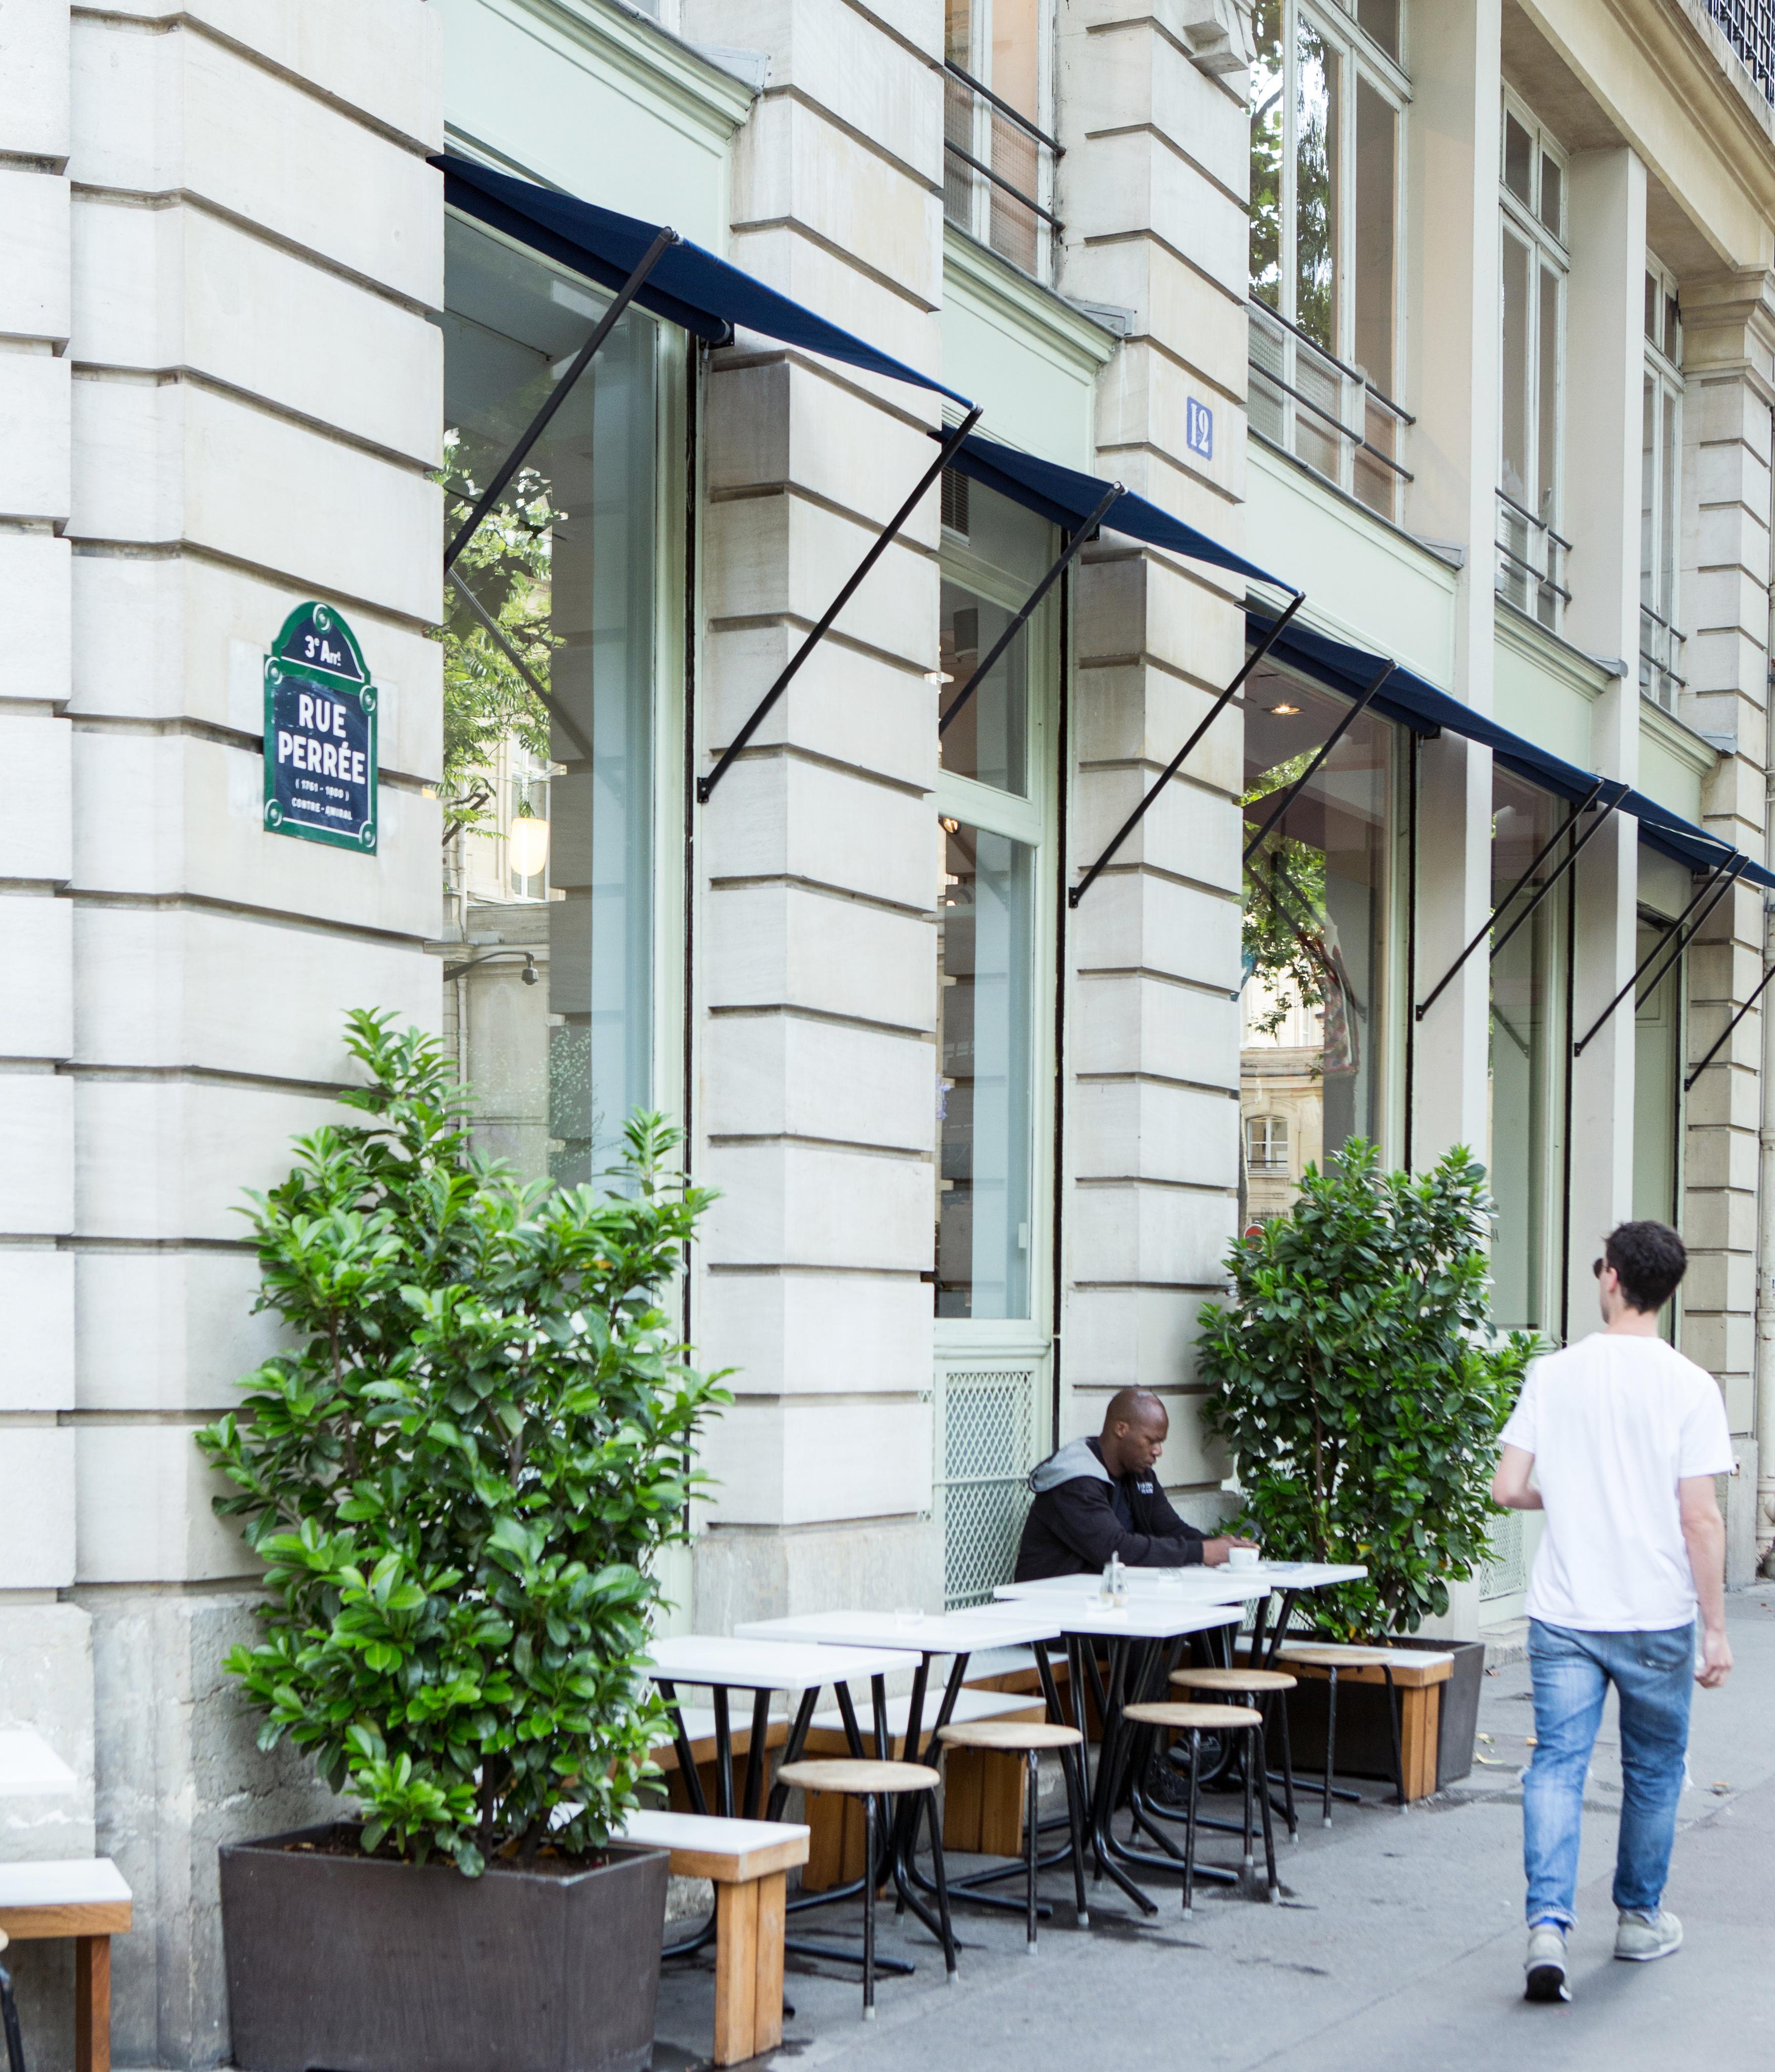 Heidi middleton 39 s paris gourmet traveller - Brunch jardin d acclimatation ...